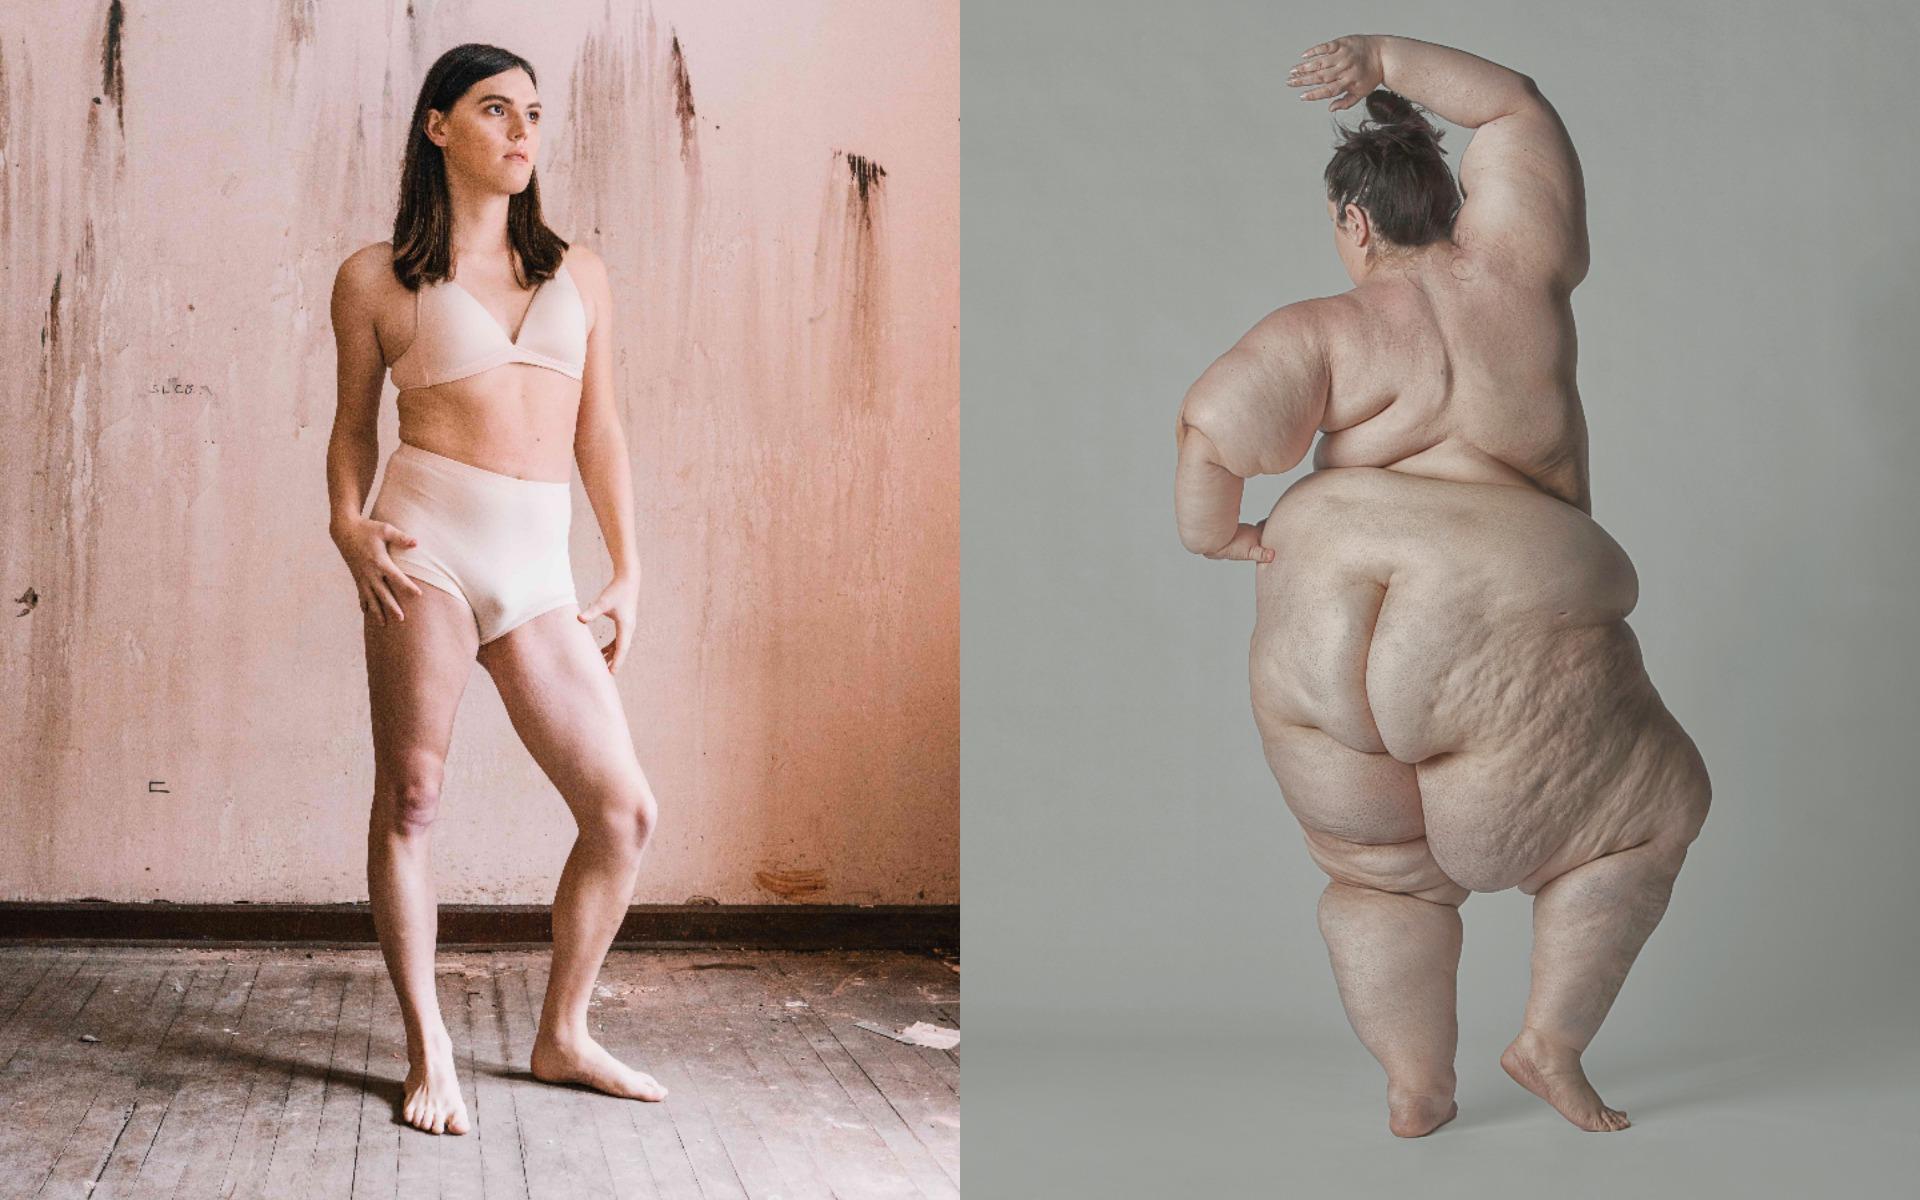 The New Show Celebrating Female Body Positivity